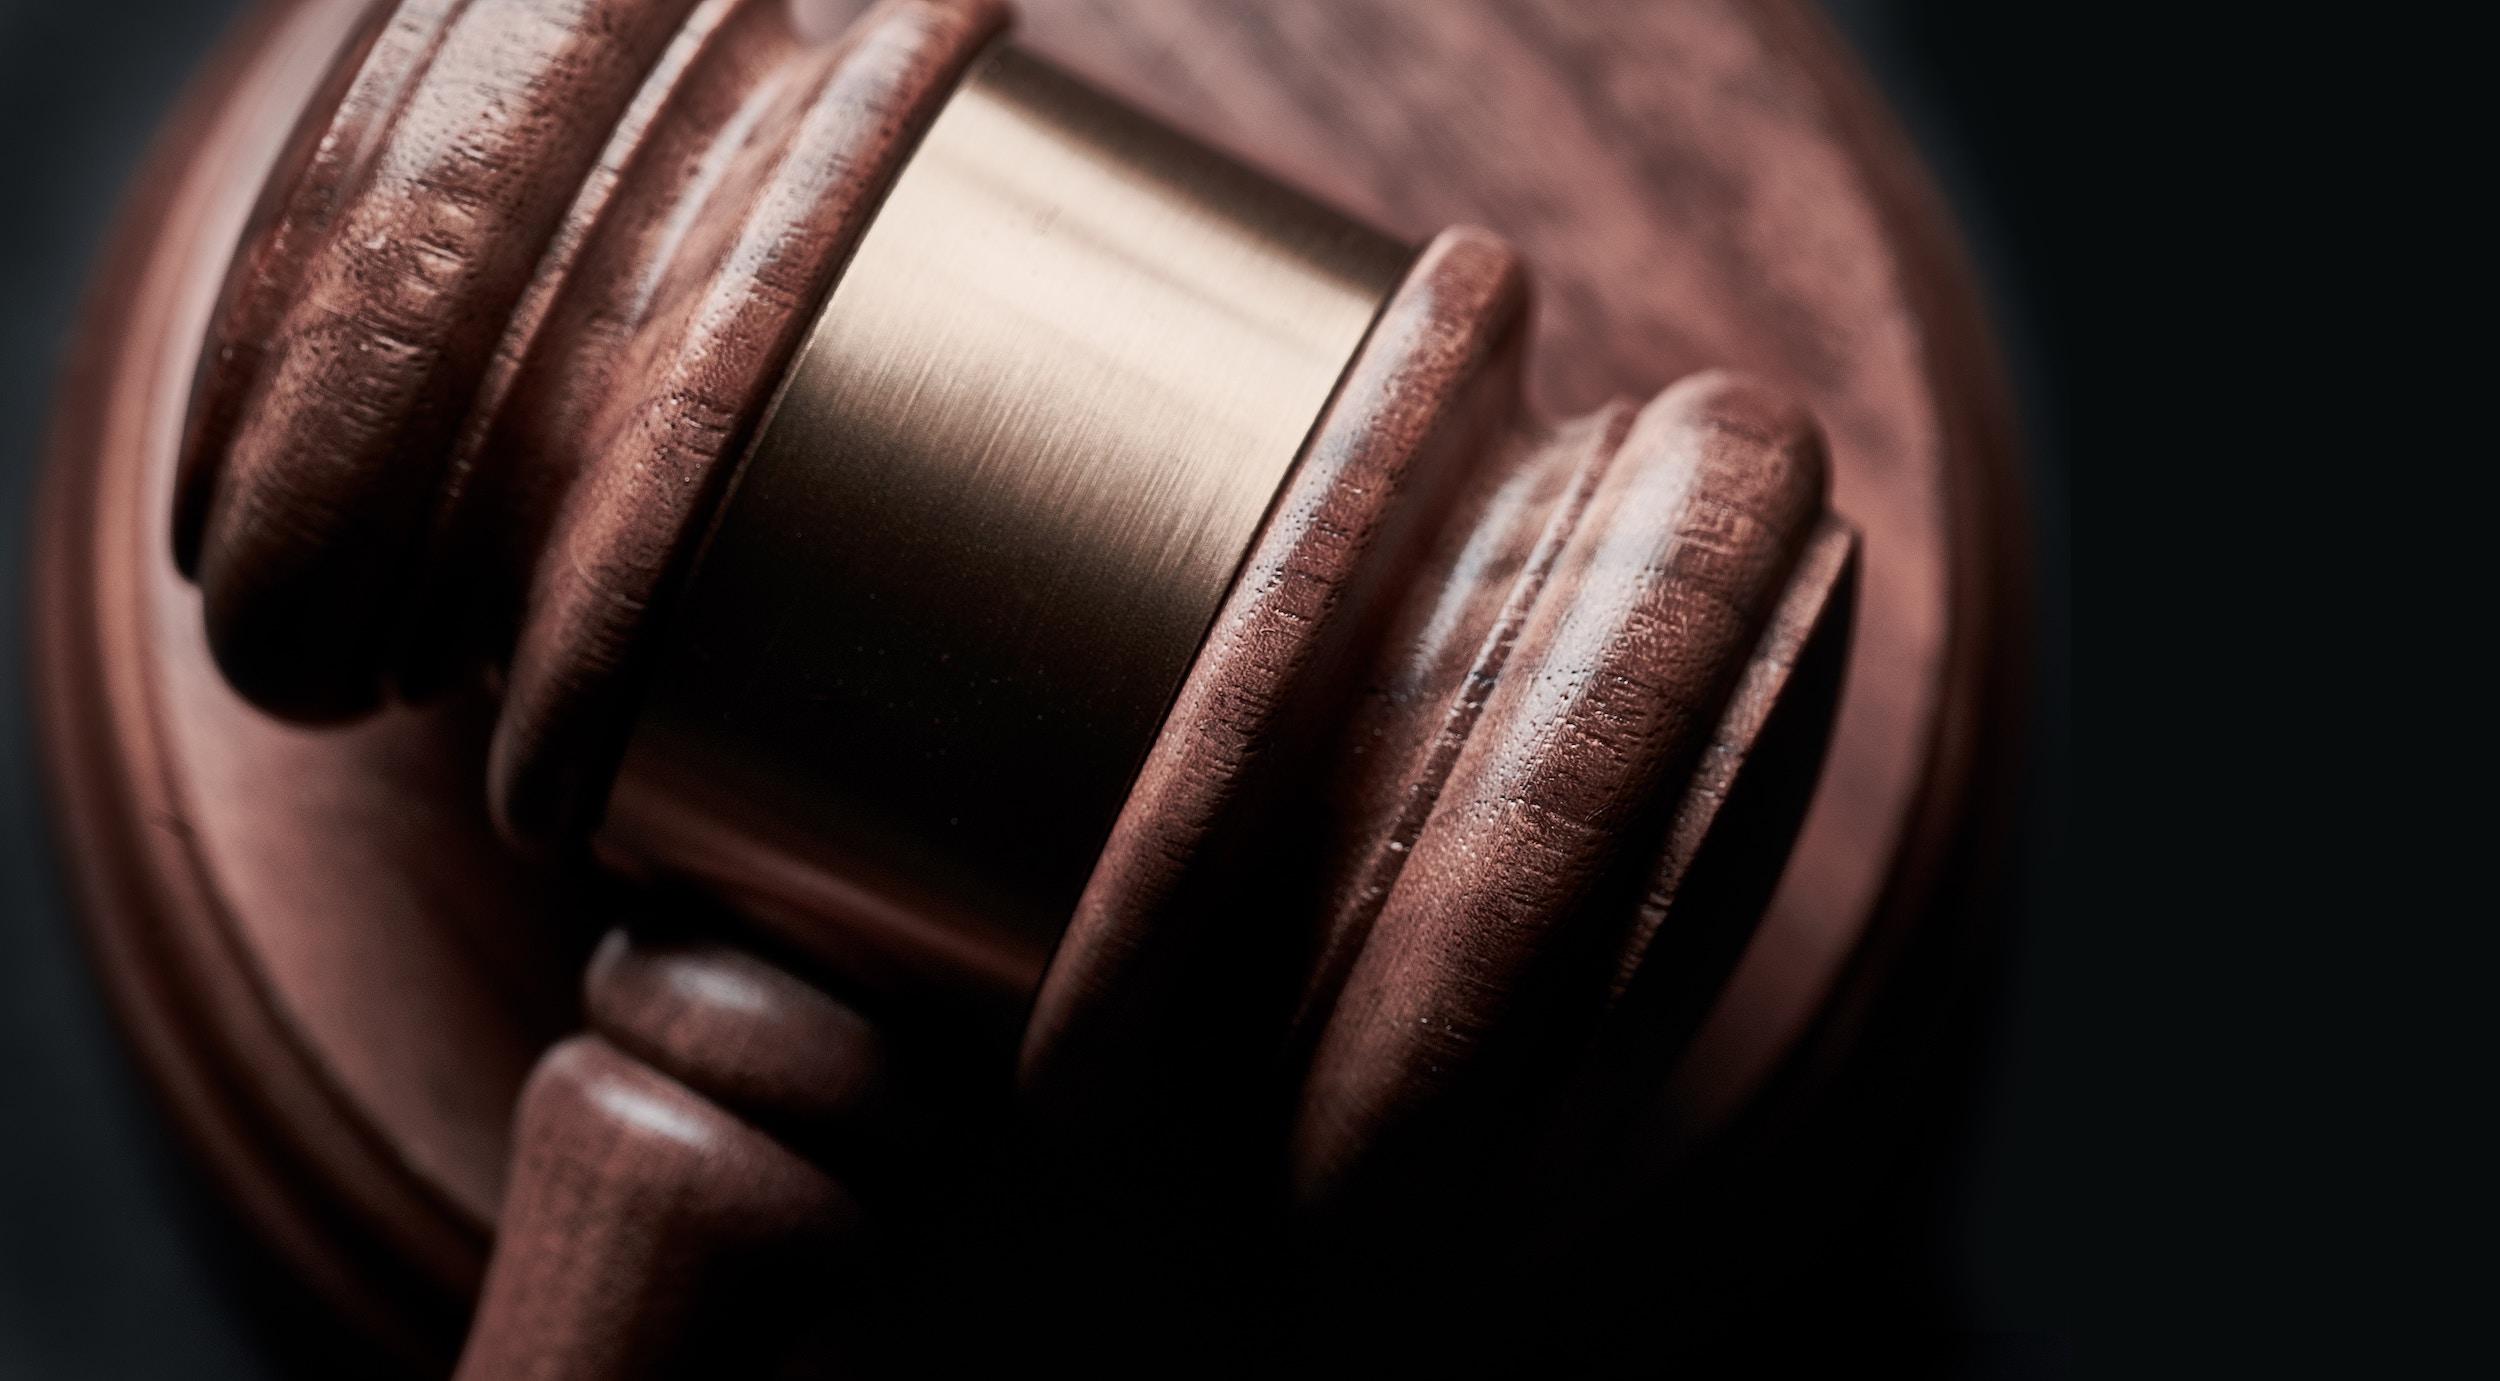 Are Psilocybin Truffles Legal?